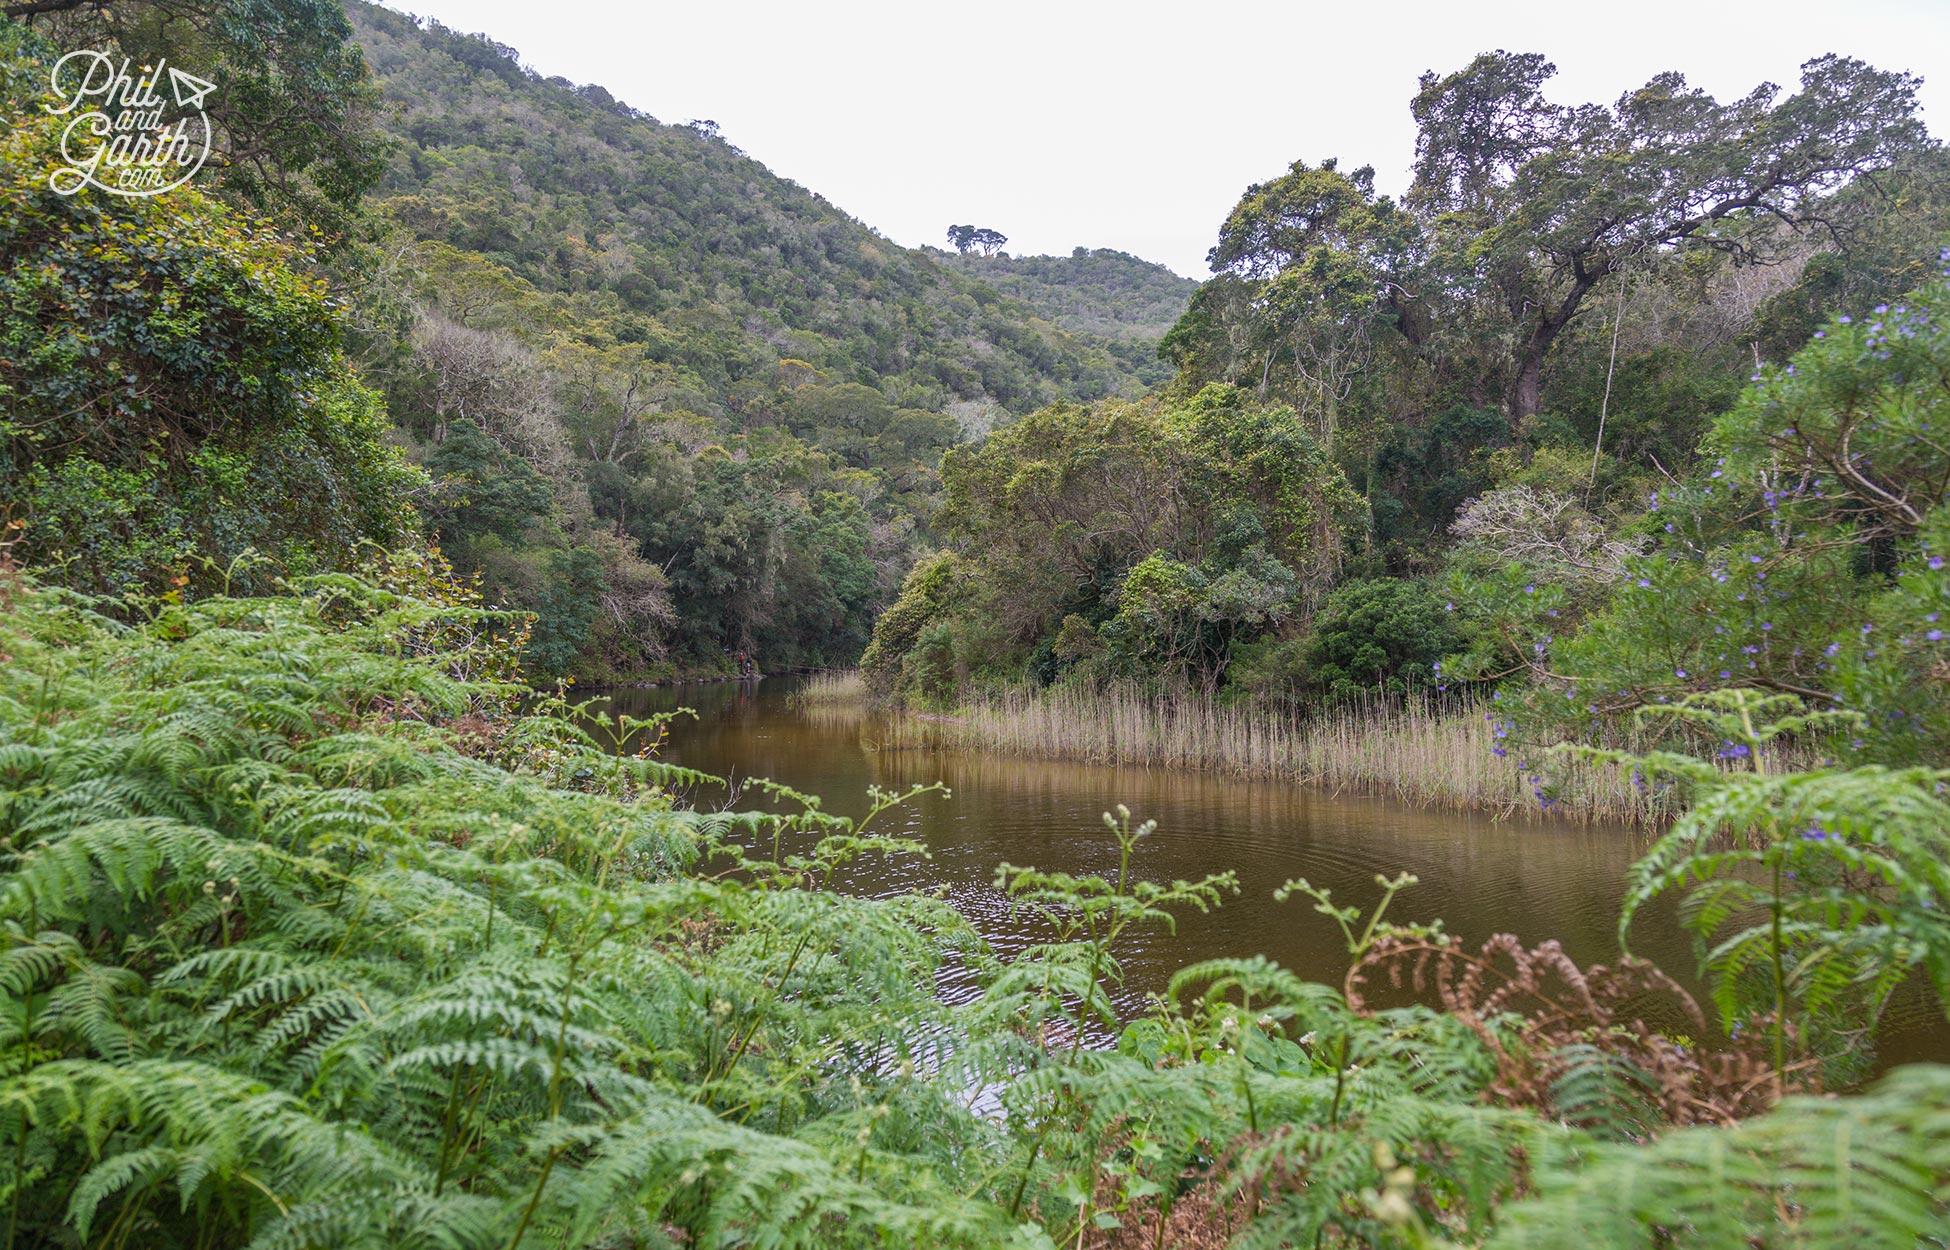 The Garden Route - Wilderness National Park